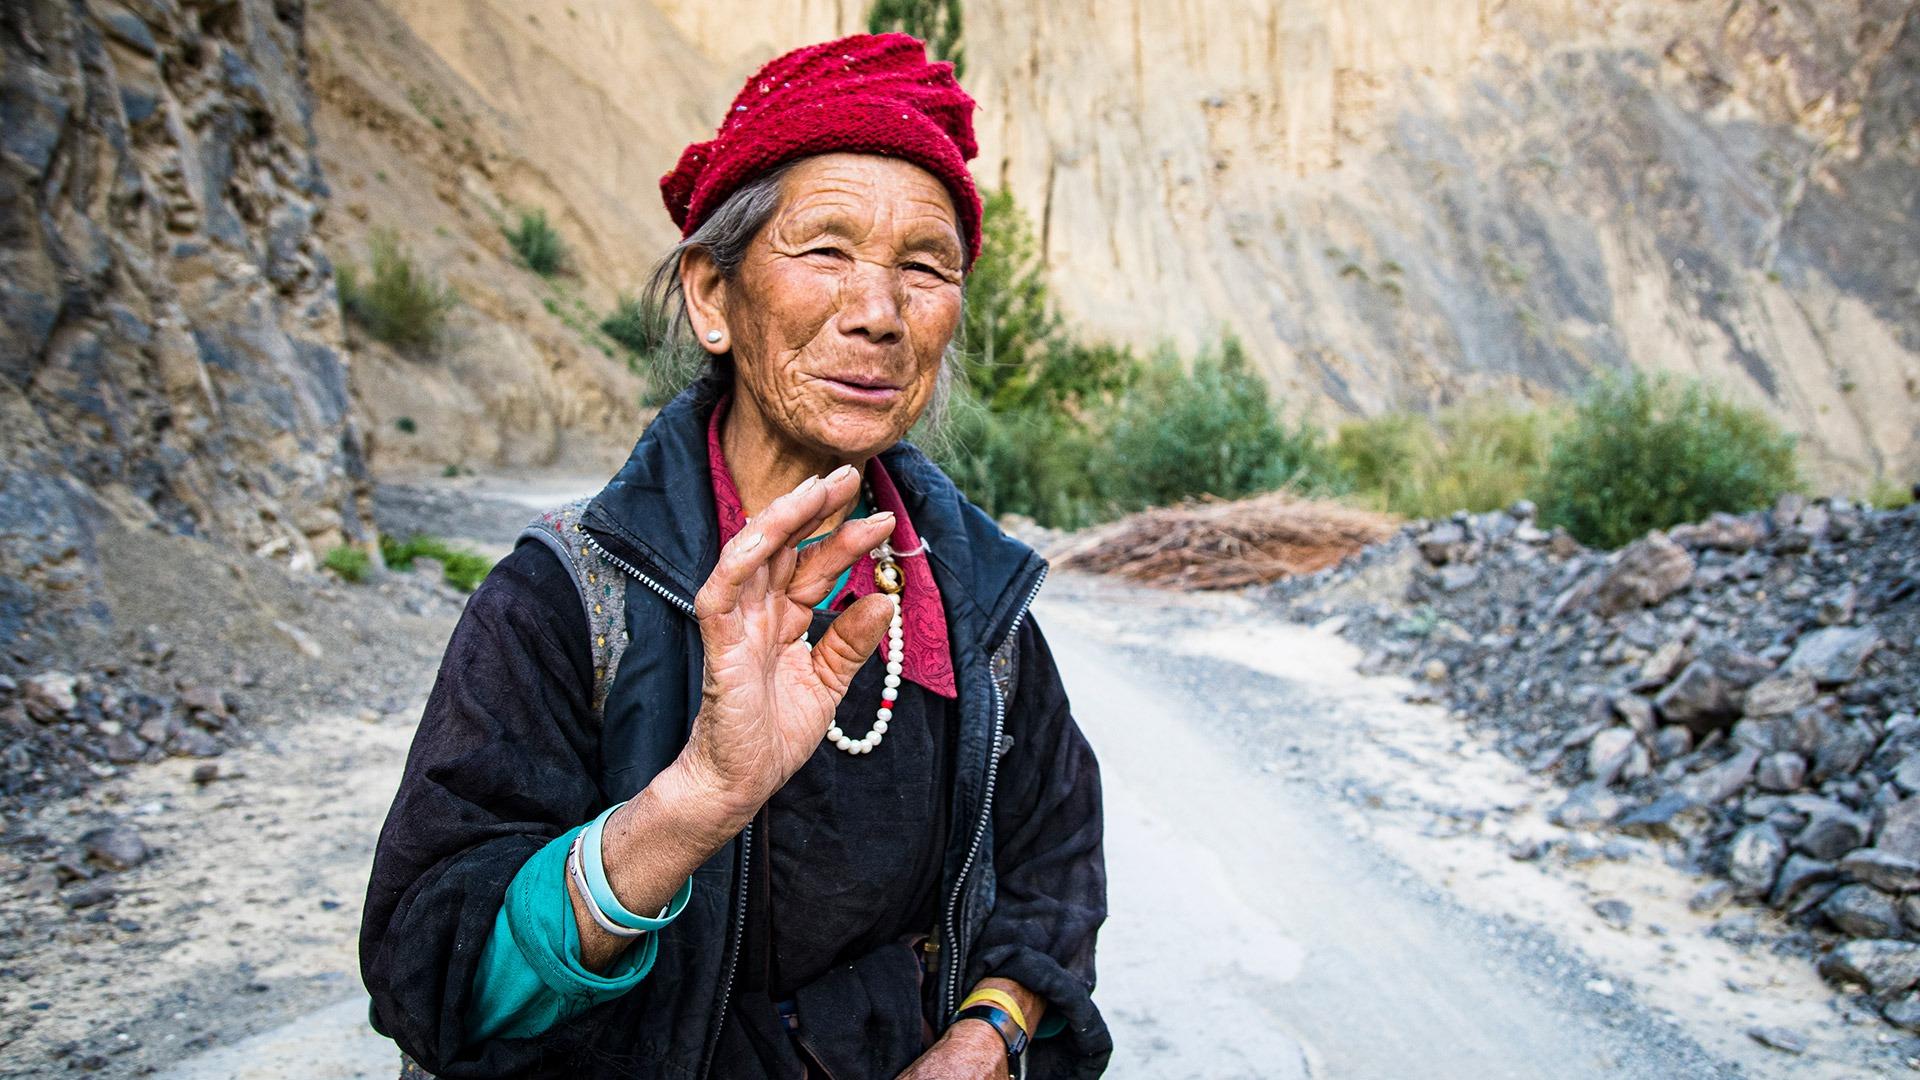 Local woman on Mangyu Gorge road, Ladakh, India